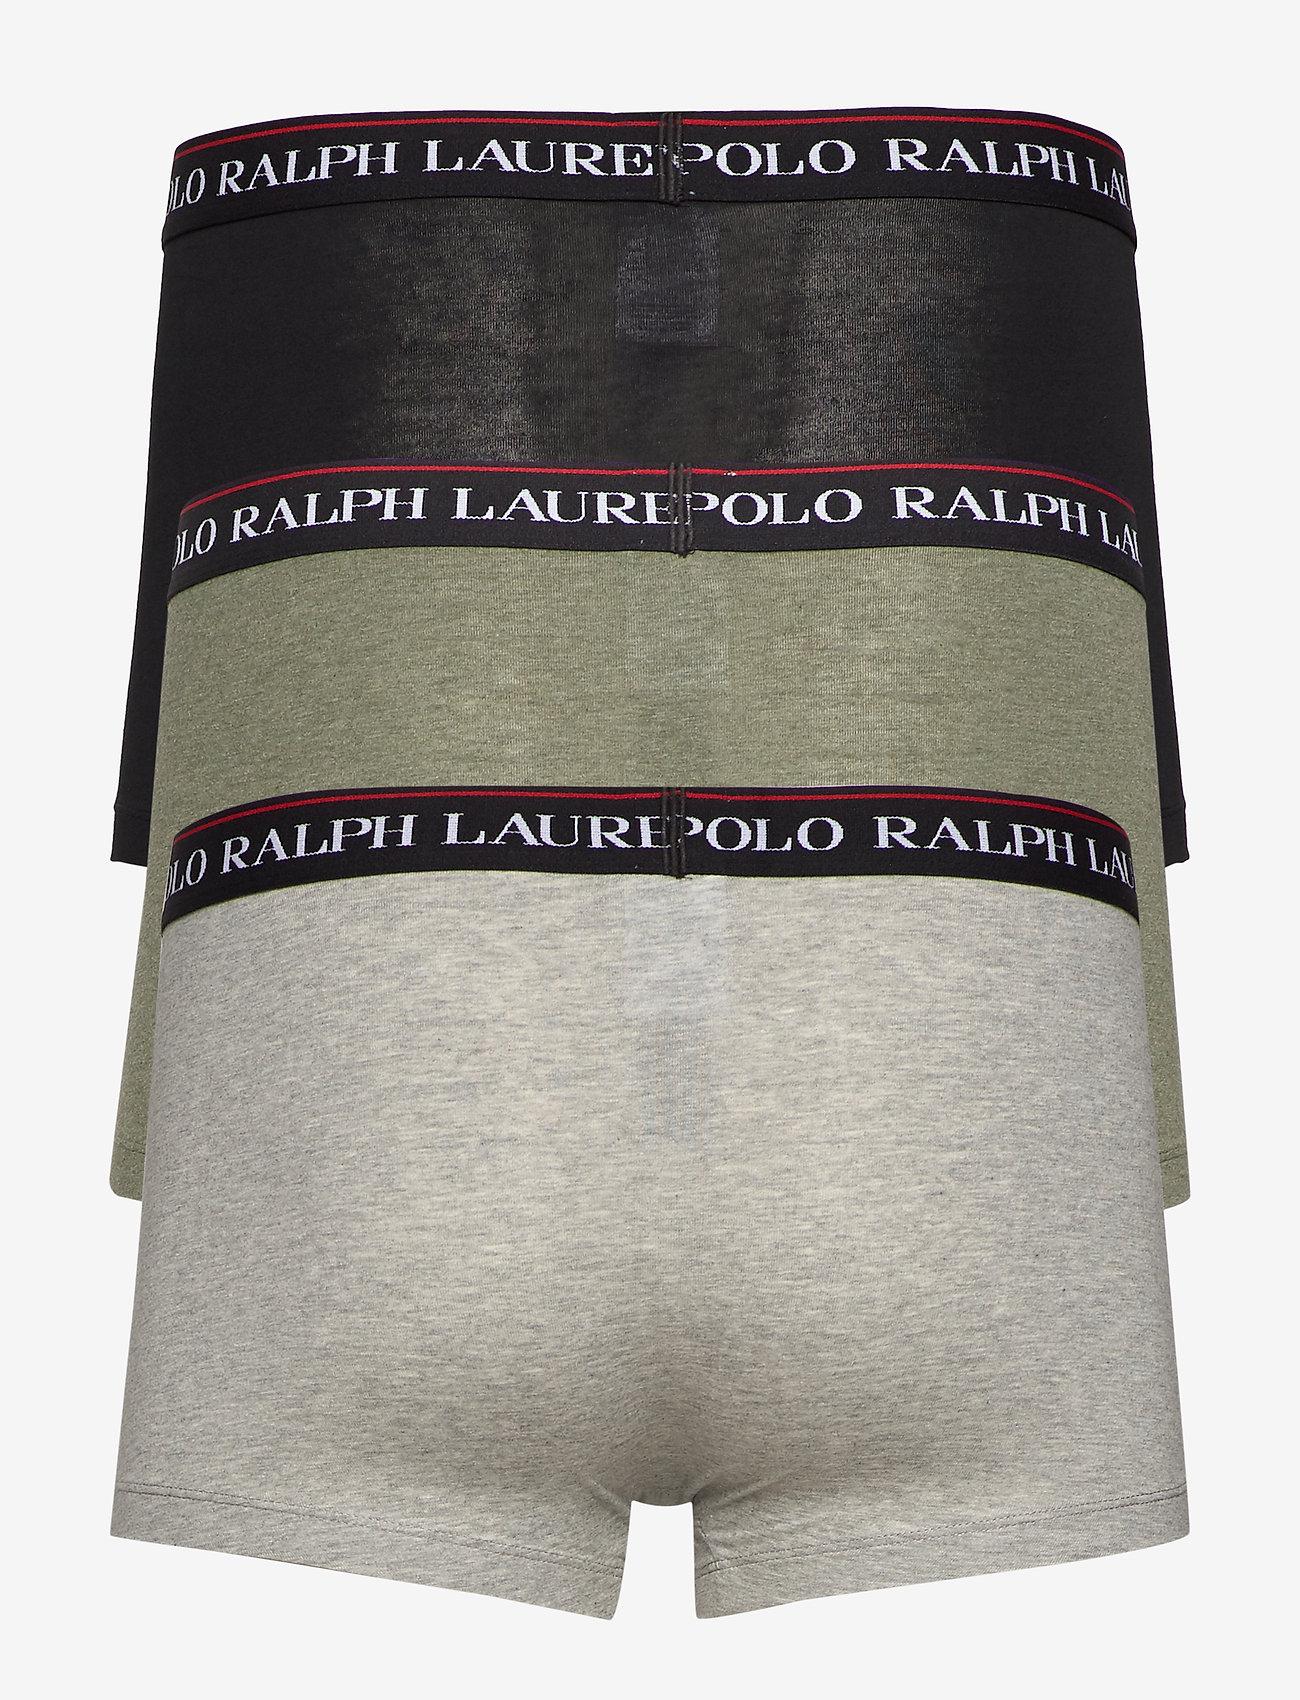 Polo Ralph Lauren Underwear - Stretch-Cotton Trunk 3-Pack - boxers - 3pk blk/and hthr/ - 1